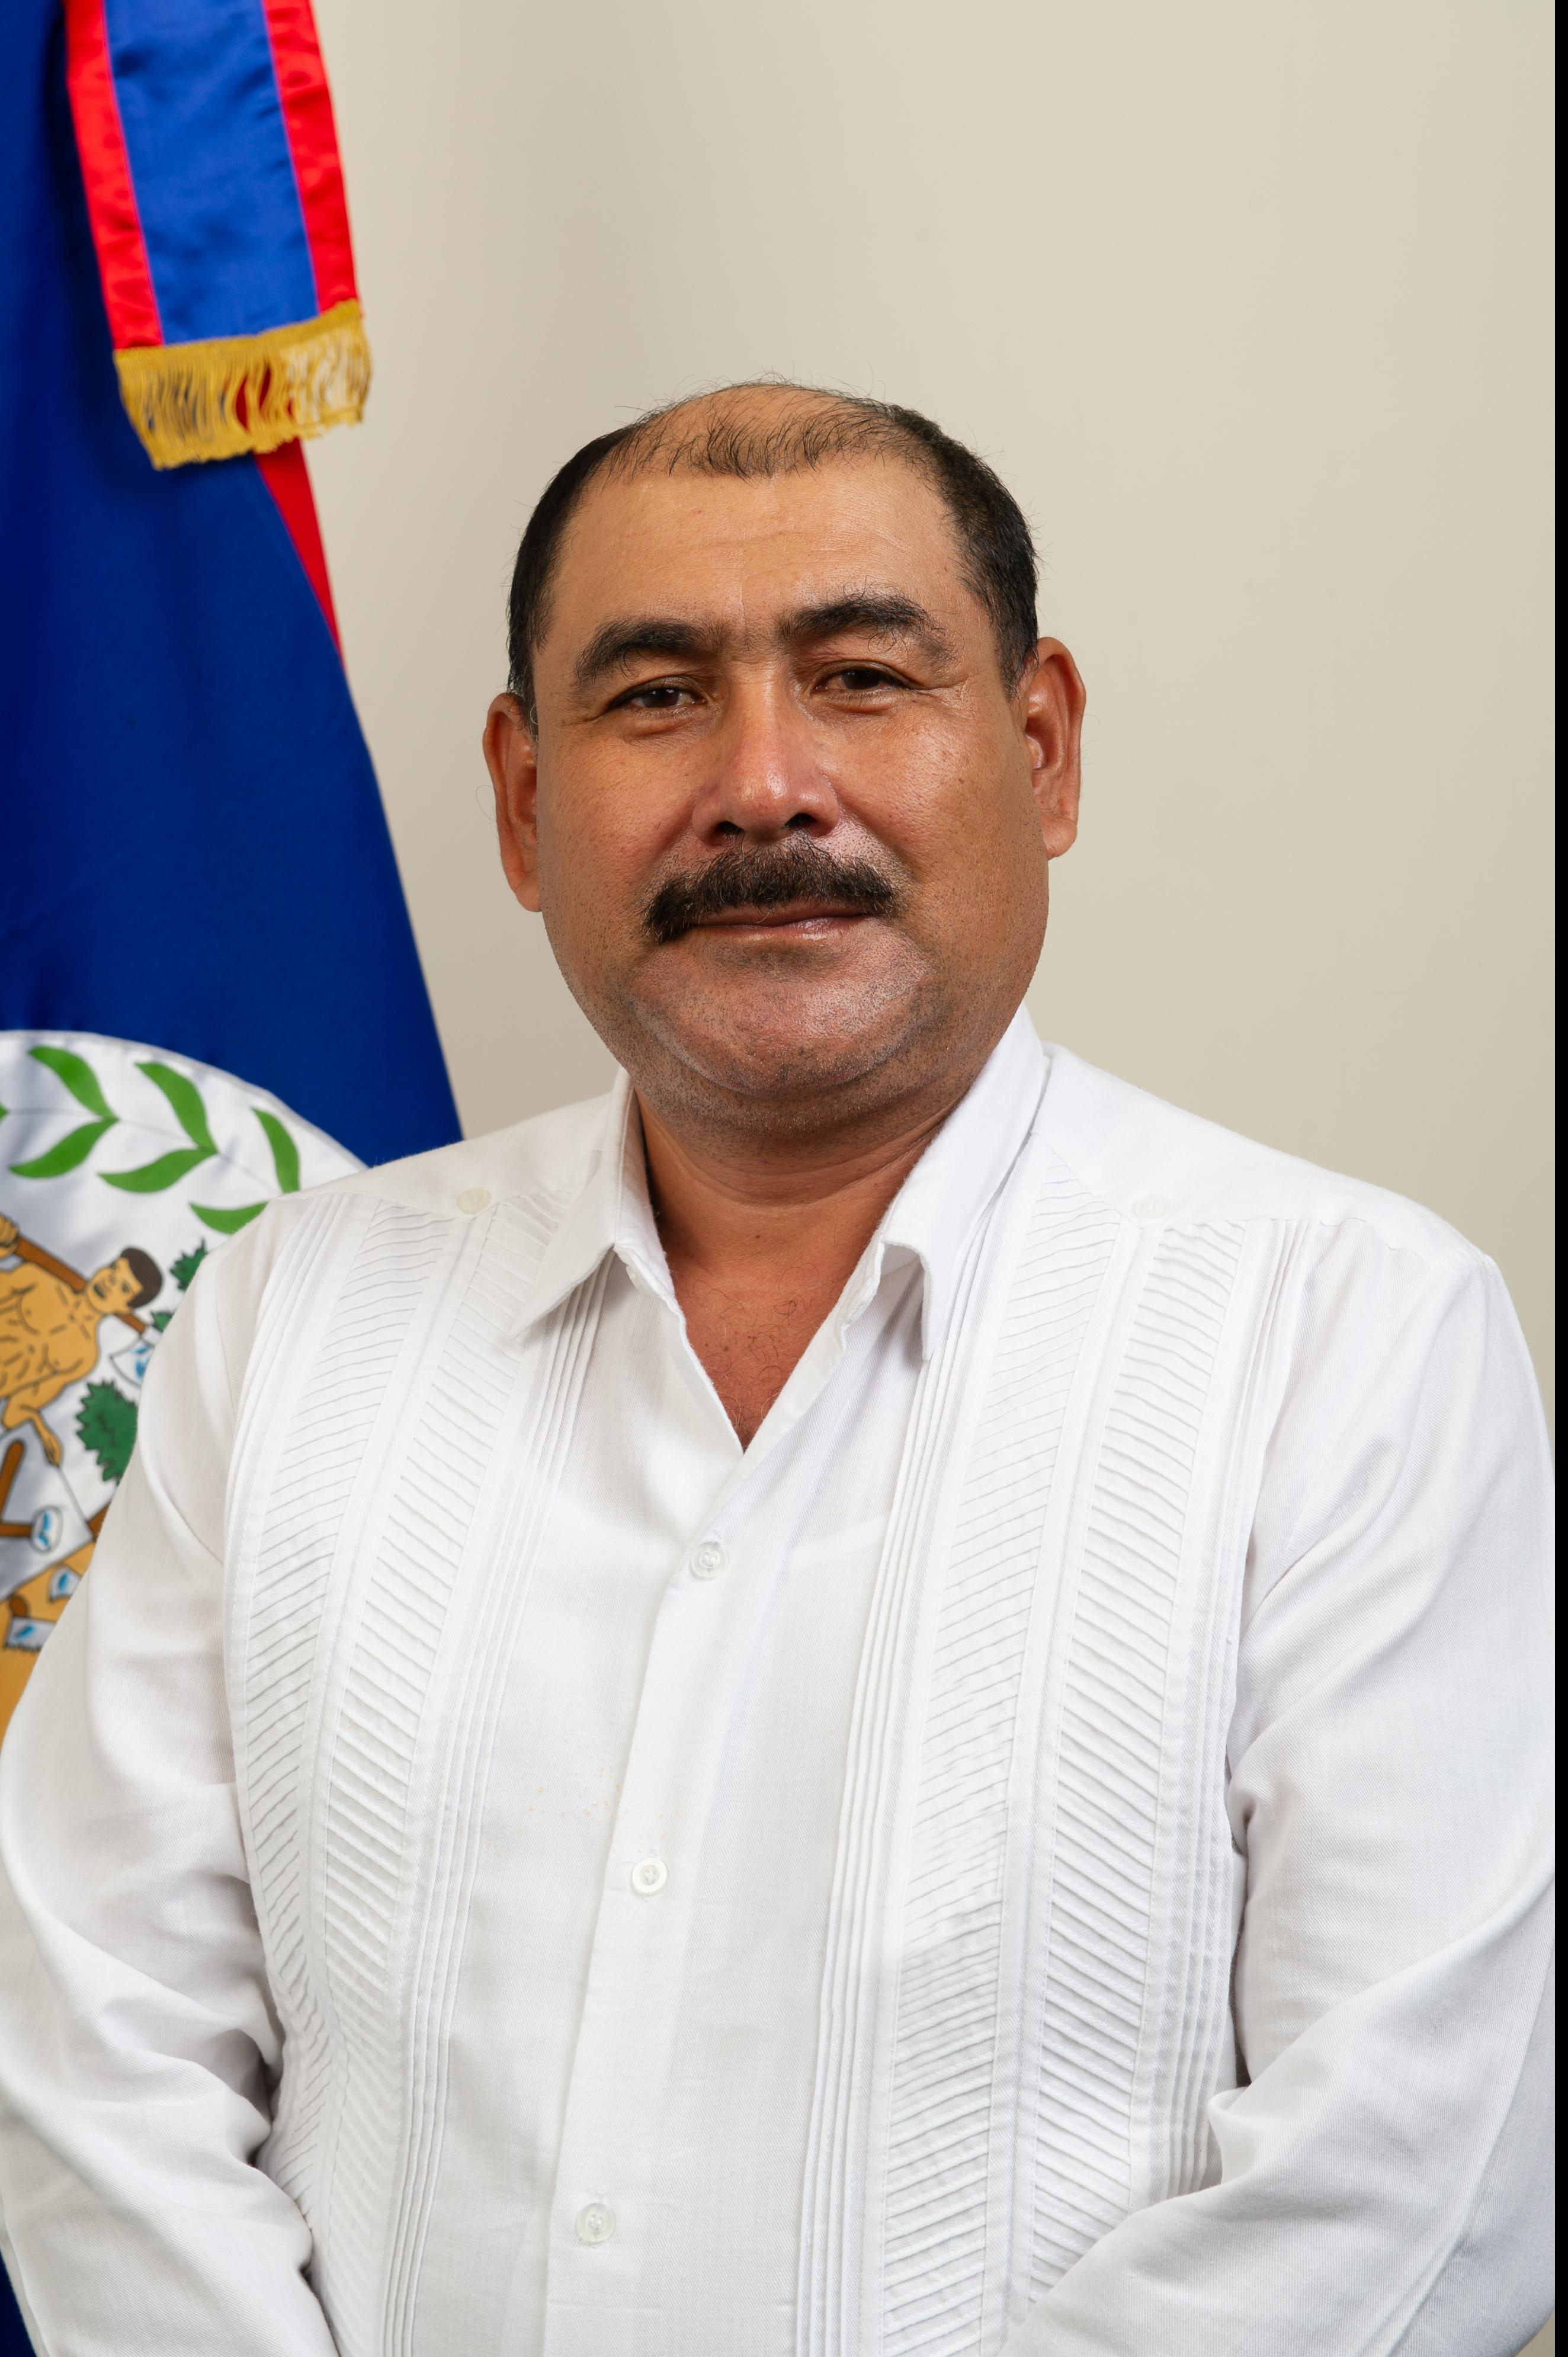 Hon. Ramiro Ramirez